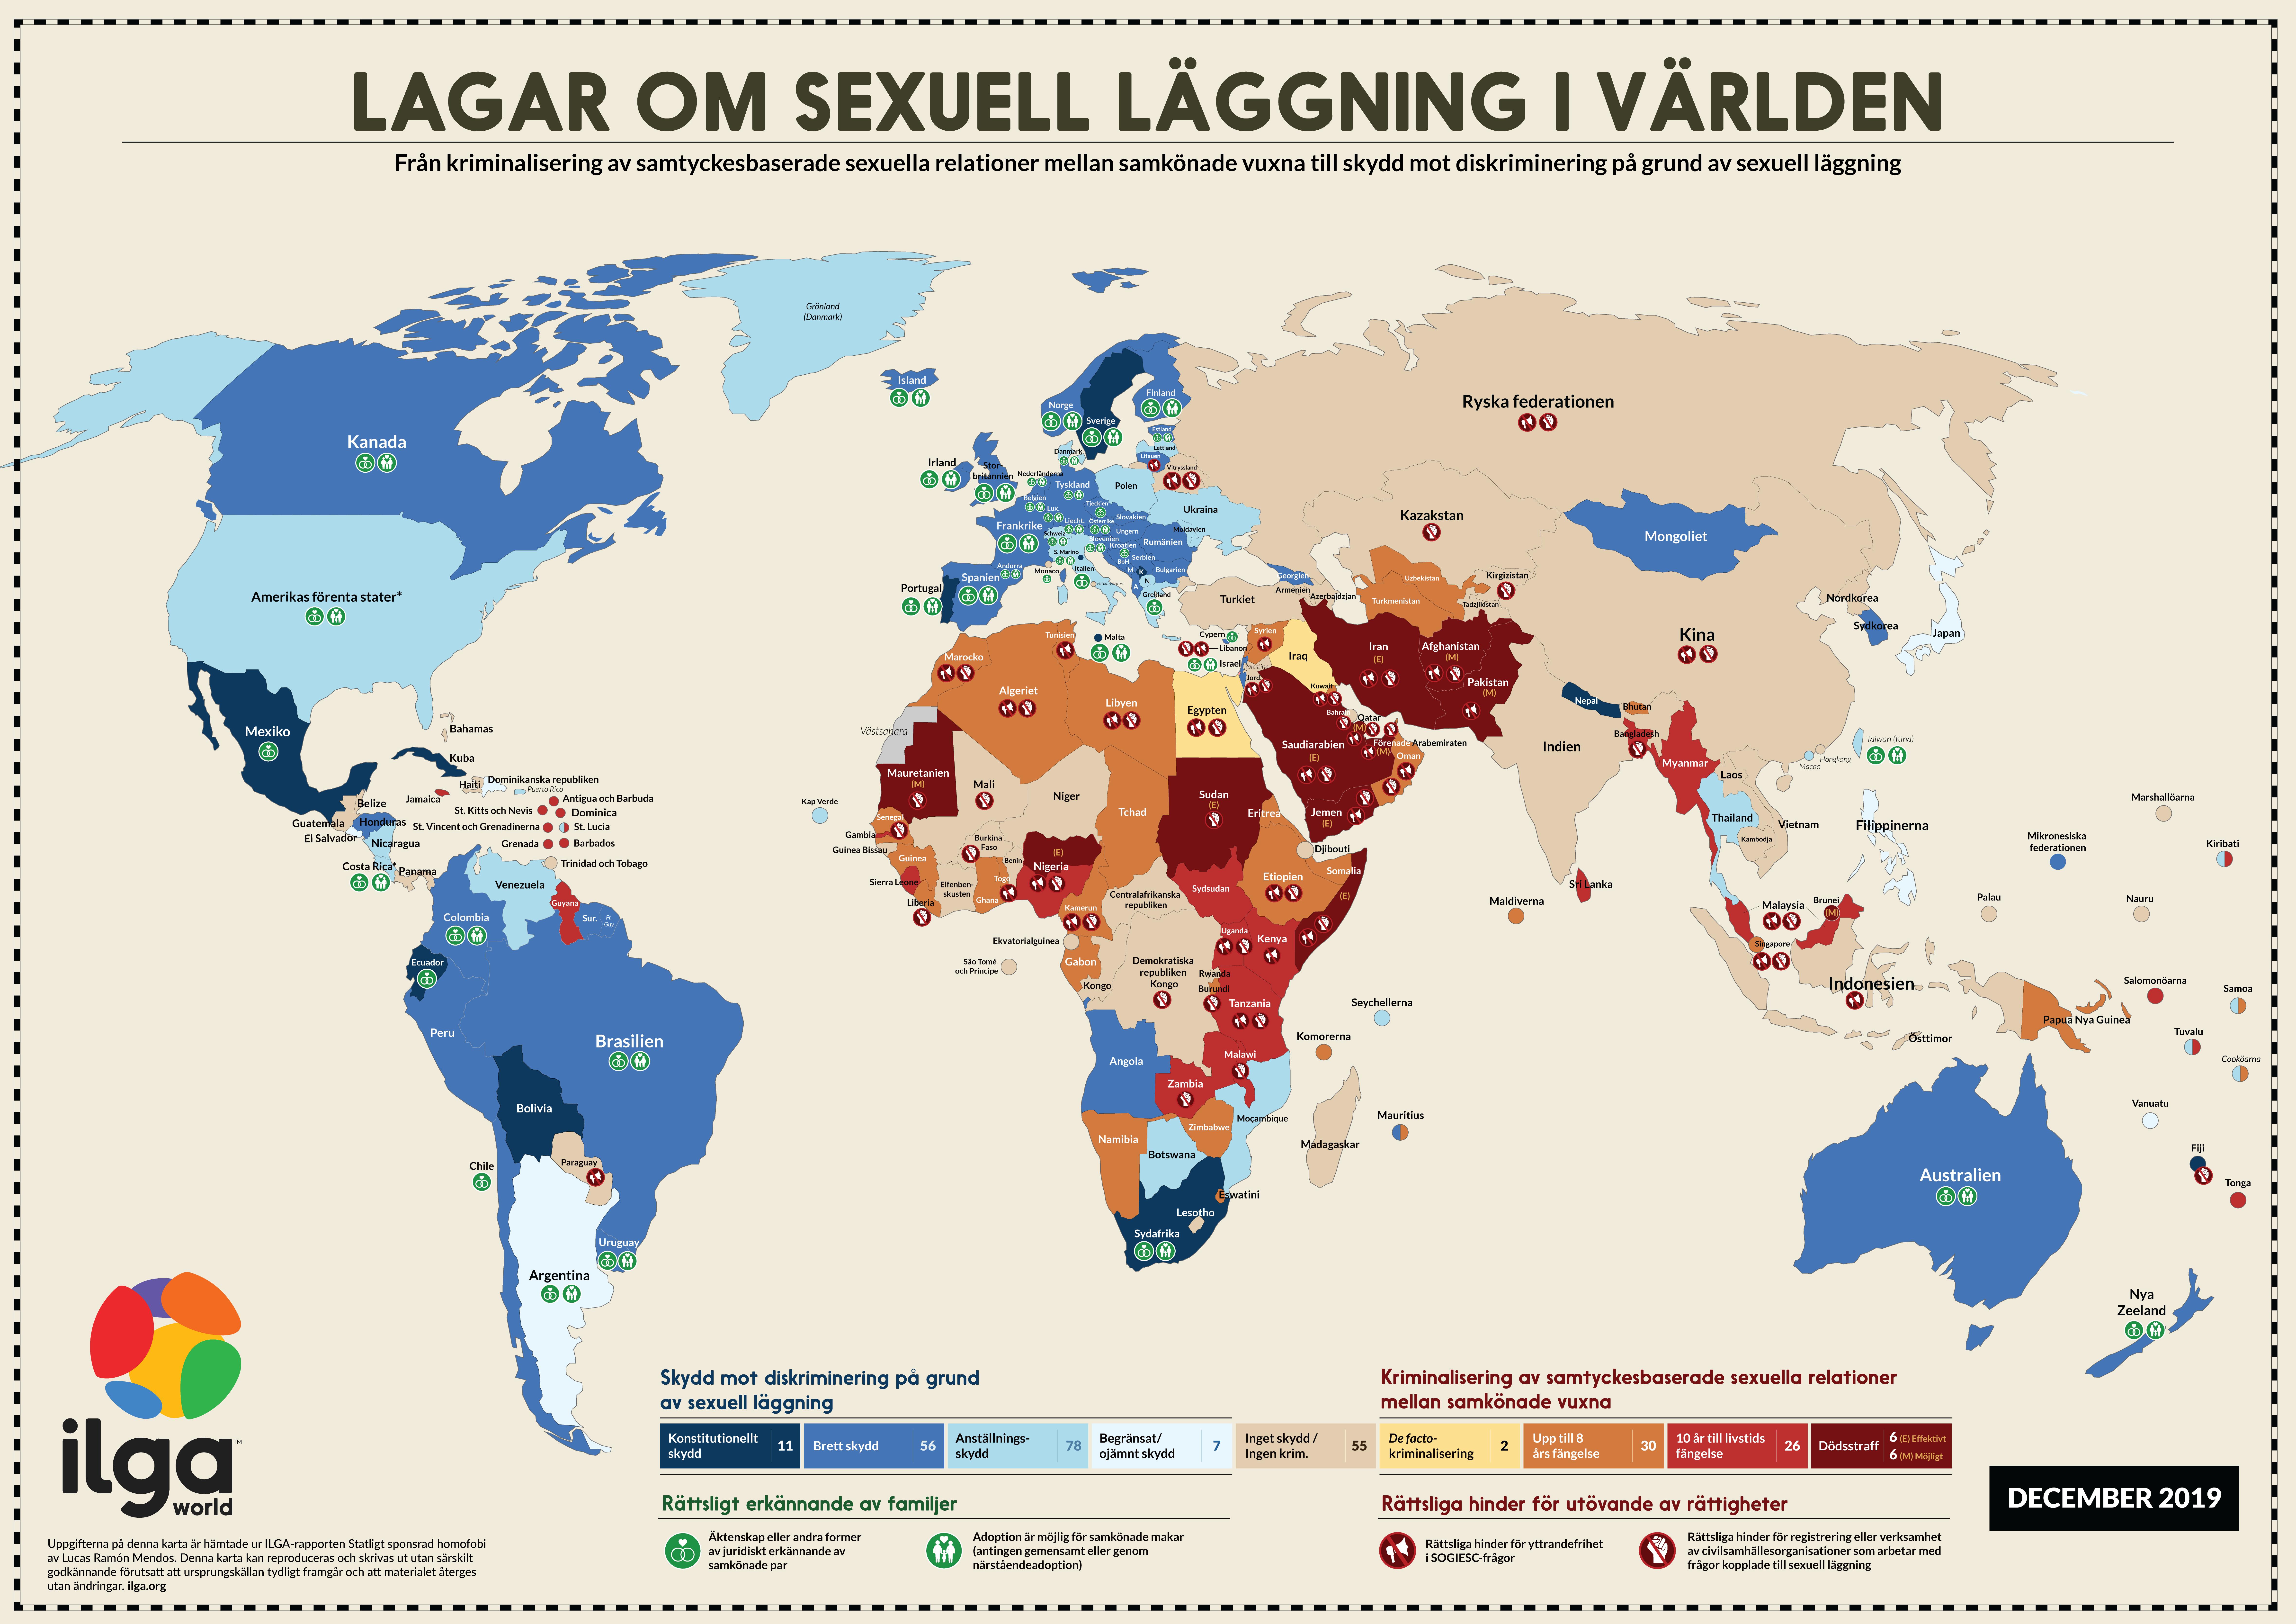 SWE_ILGA_World_map_sexual_orientation_laws_dec2019_update